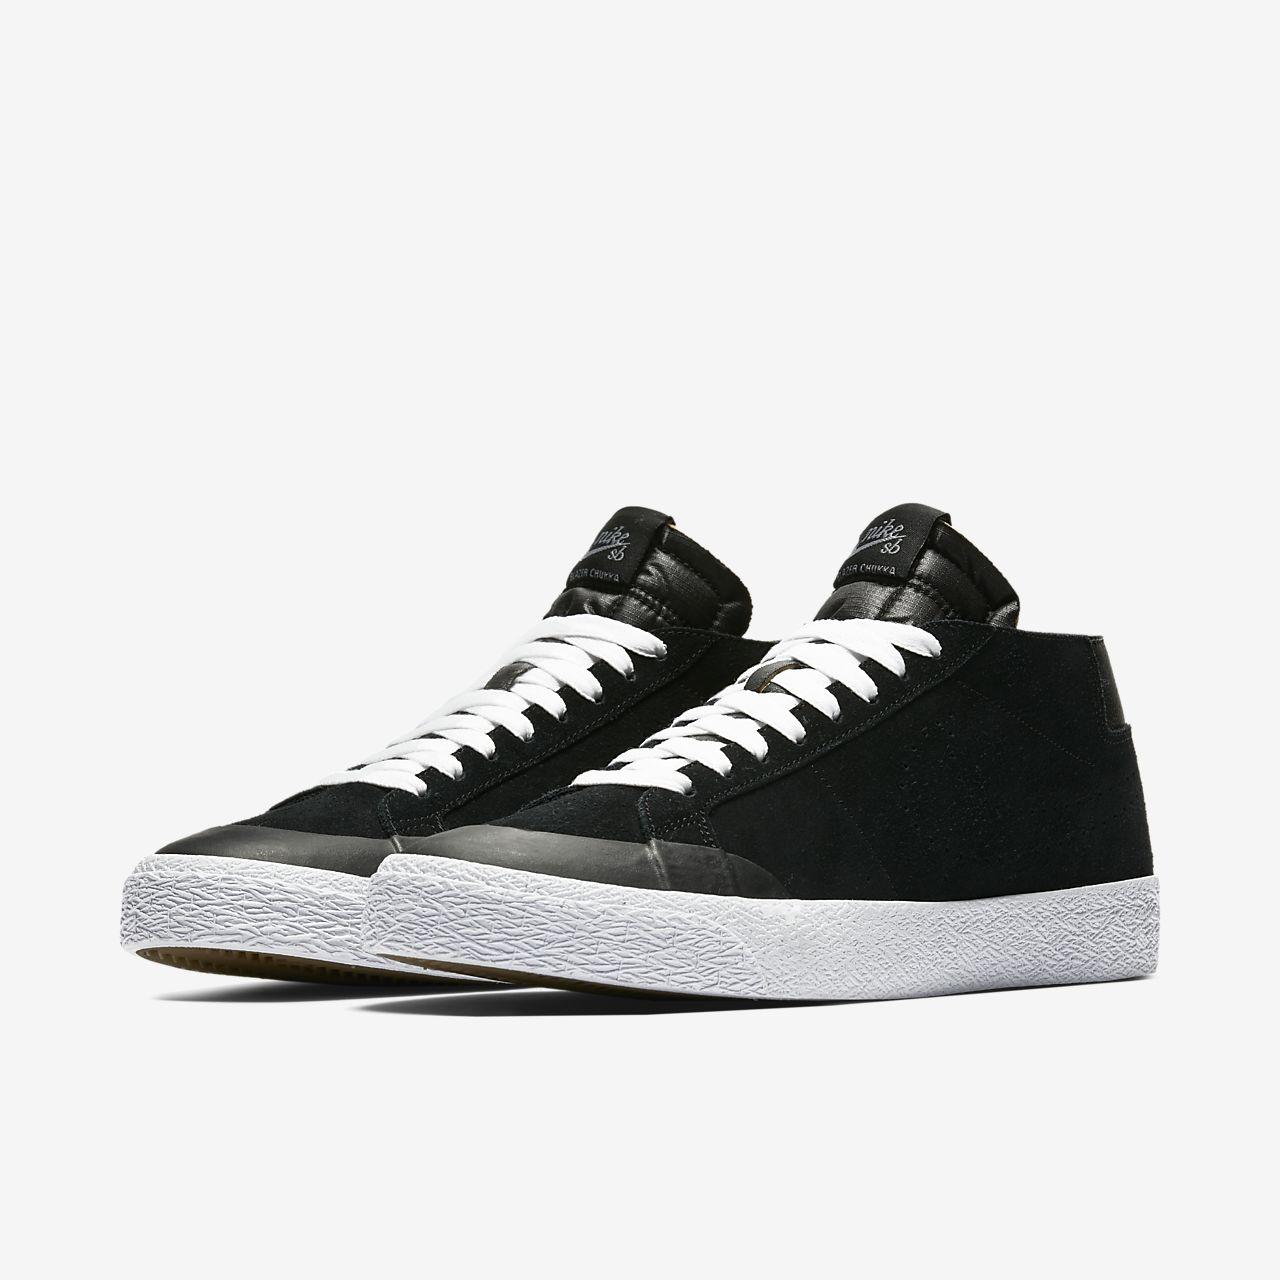 the latest d18d3 49df4 ... Skateboardsko Nike SB Zoom Blazer Chukka XT för män